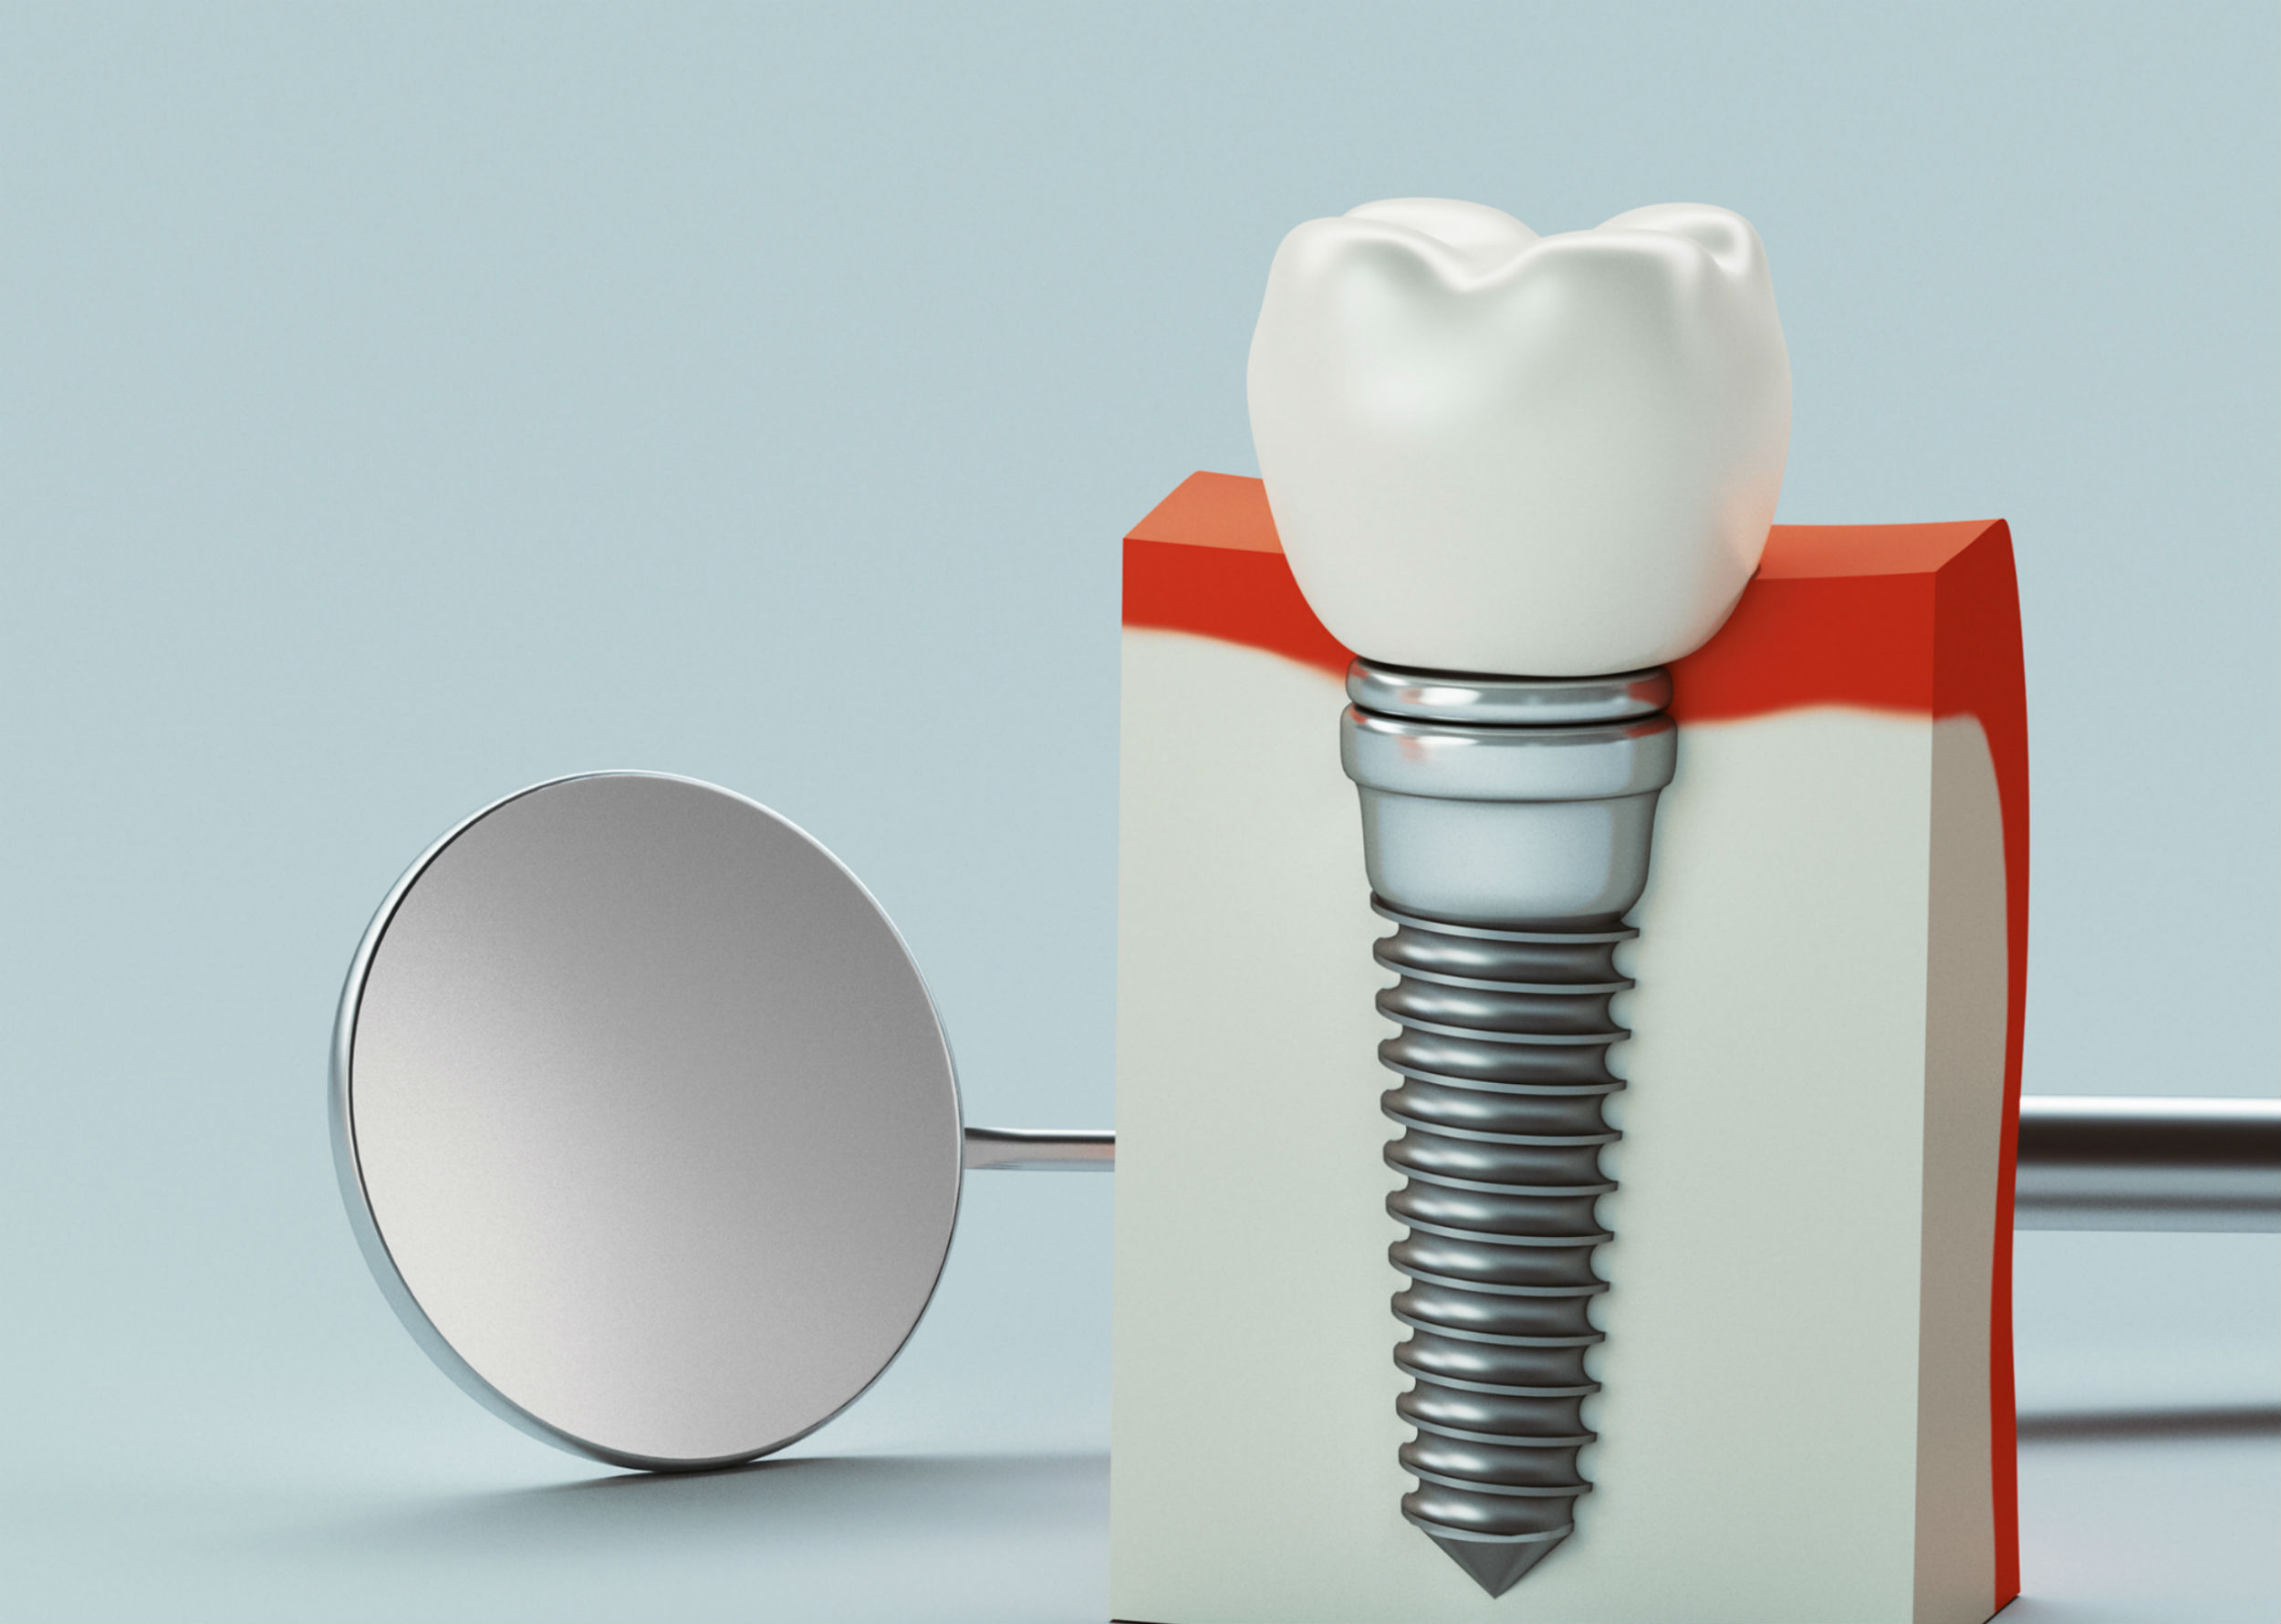 nc-dental-implants